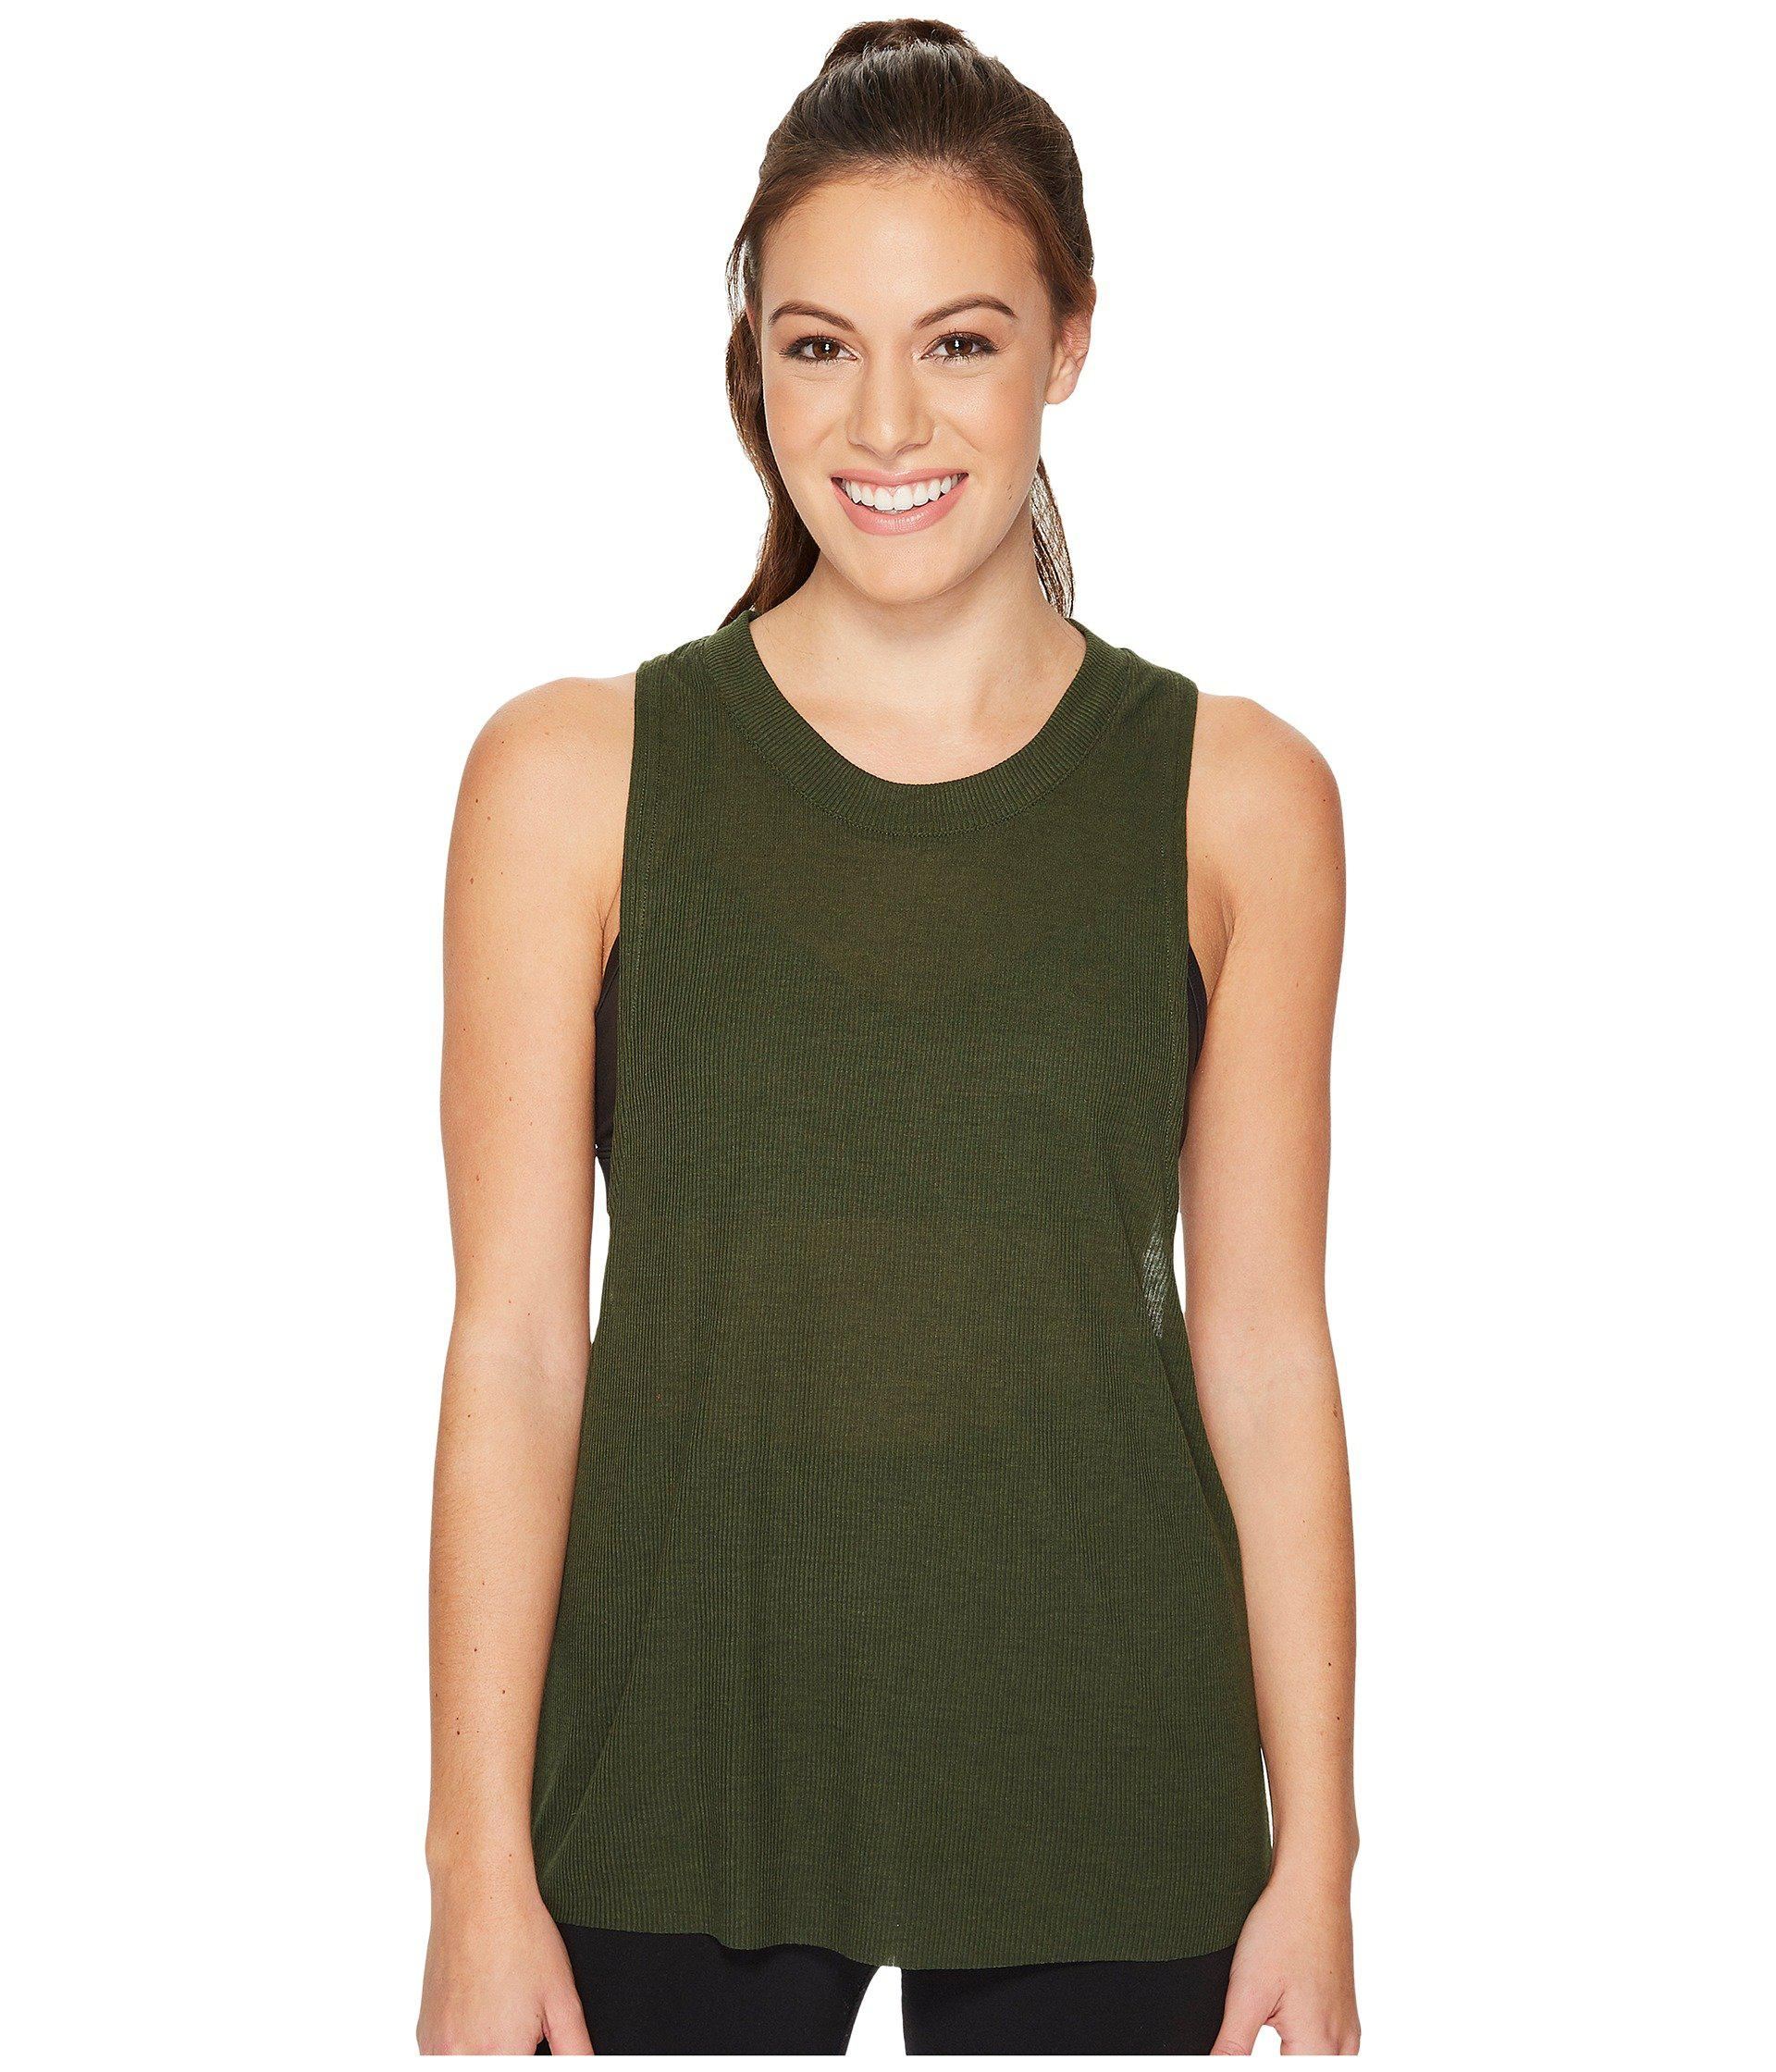 8927f29ee573c Lyst - Alo Yoga Heat-wave Tank Top (pistachio) Women s Sleeveless in ...